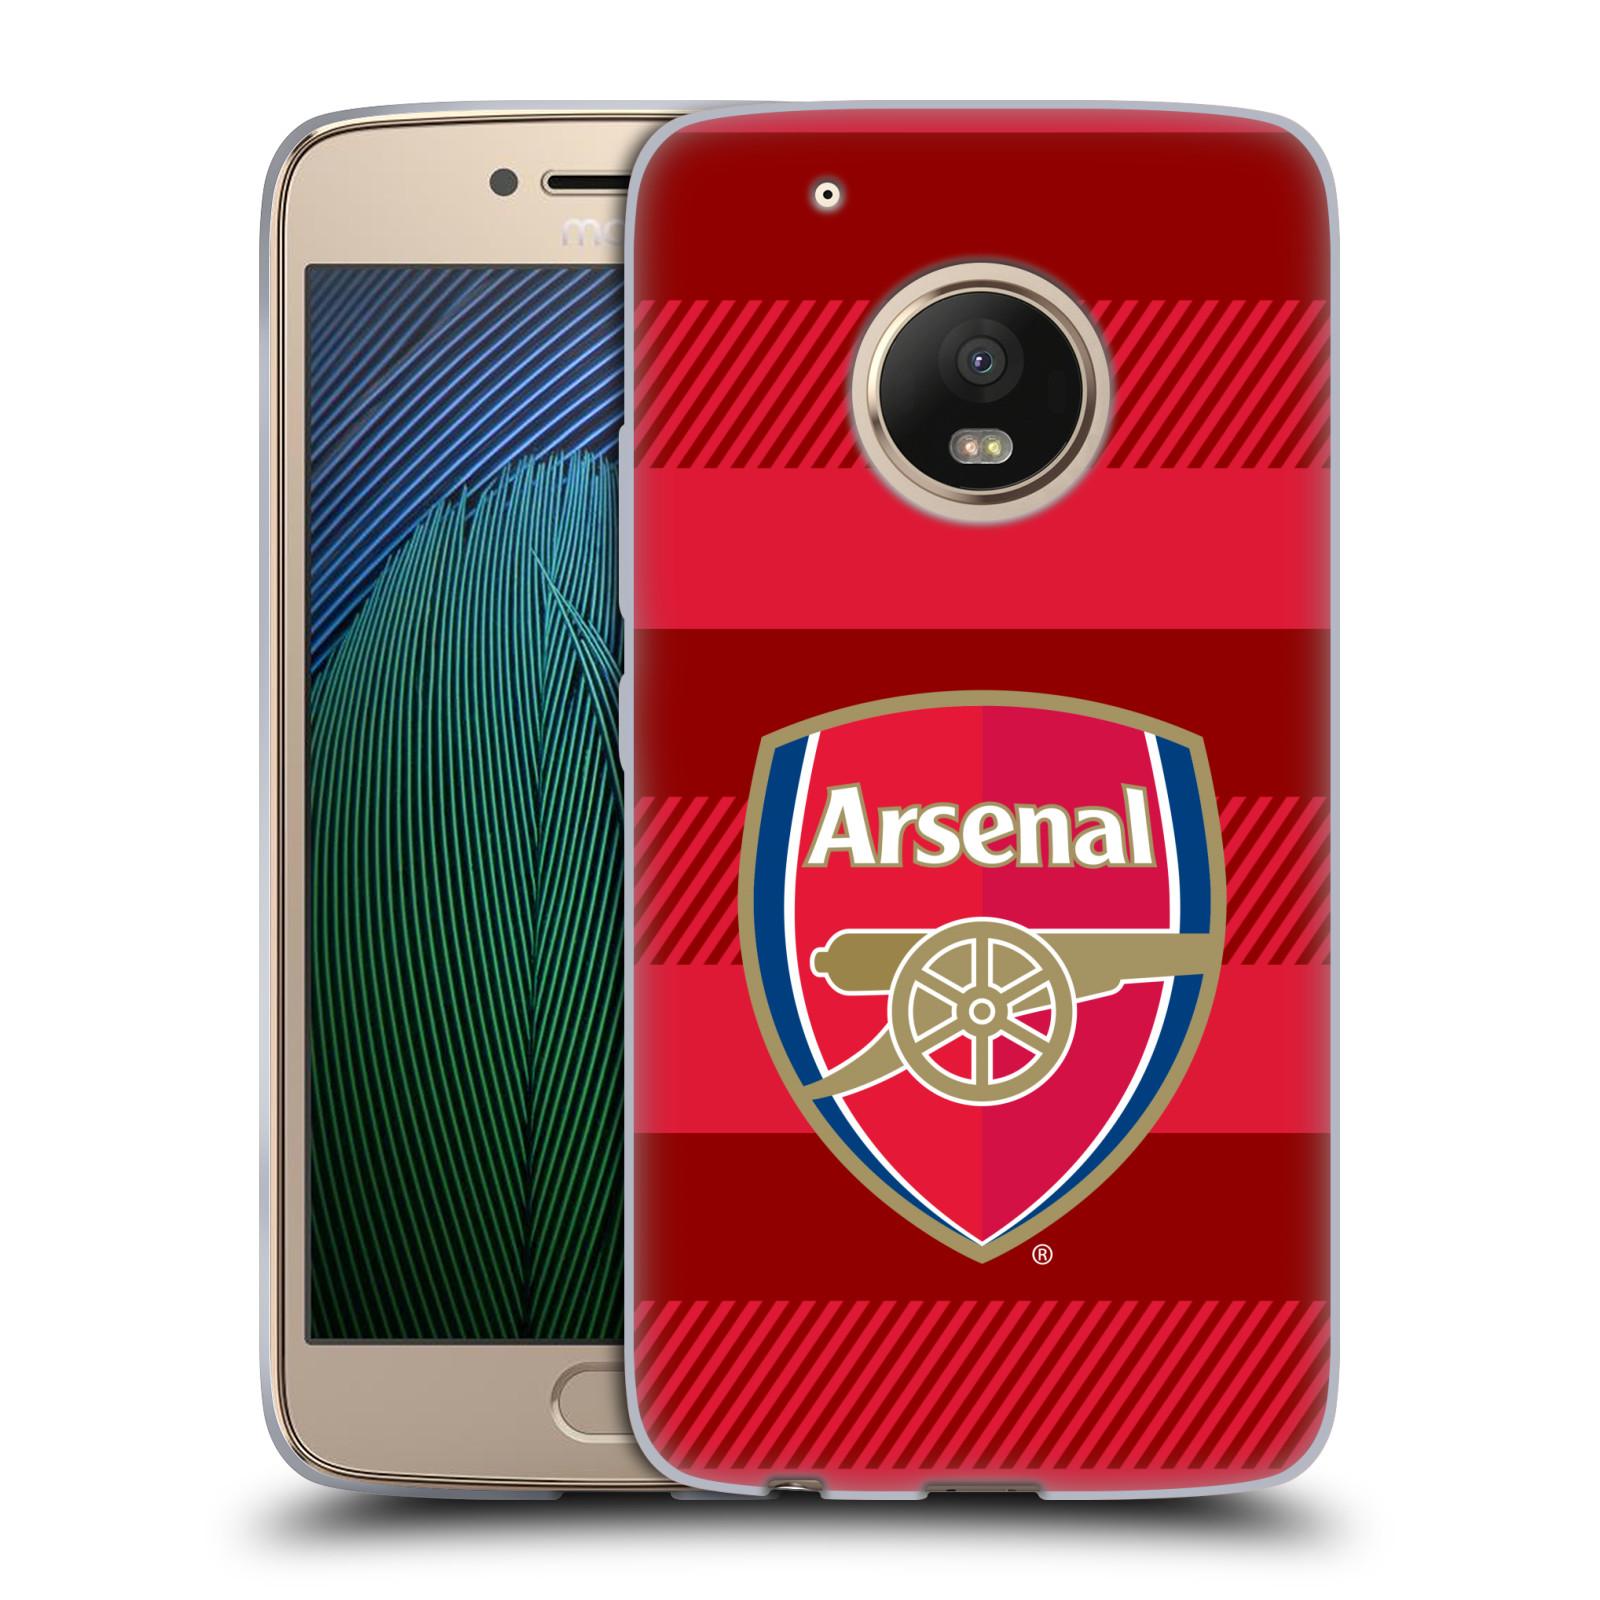 Silikonové pouzdro na mobil Lenovo Moto G5 Plus - Head Case - Arsenal FC - Logo s pruhy